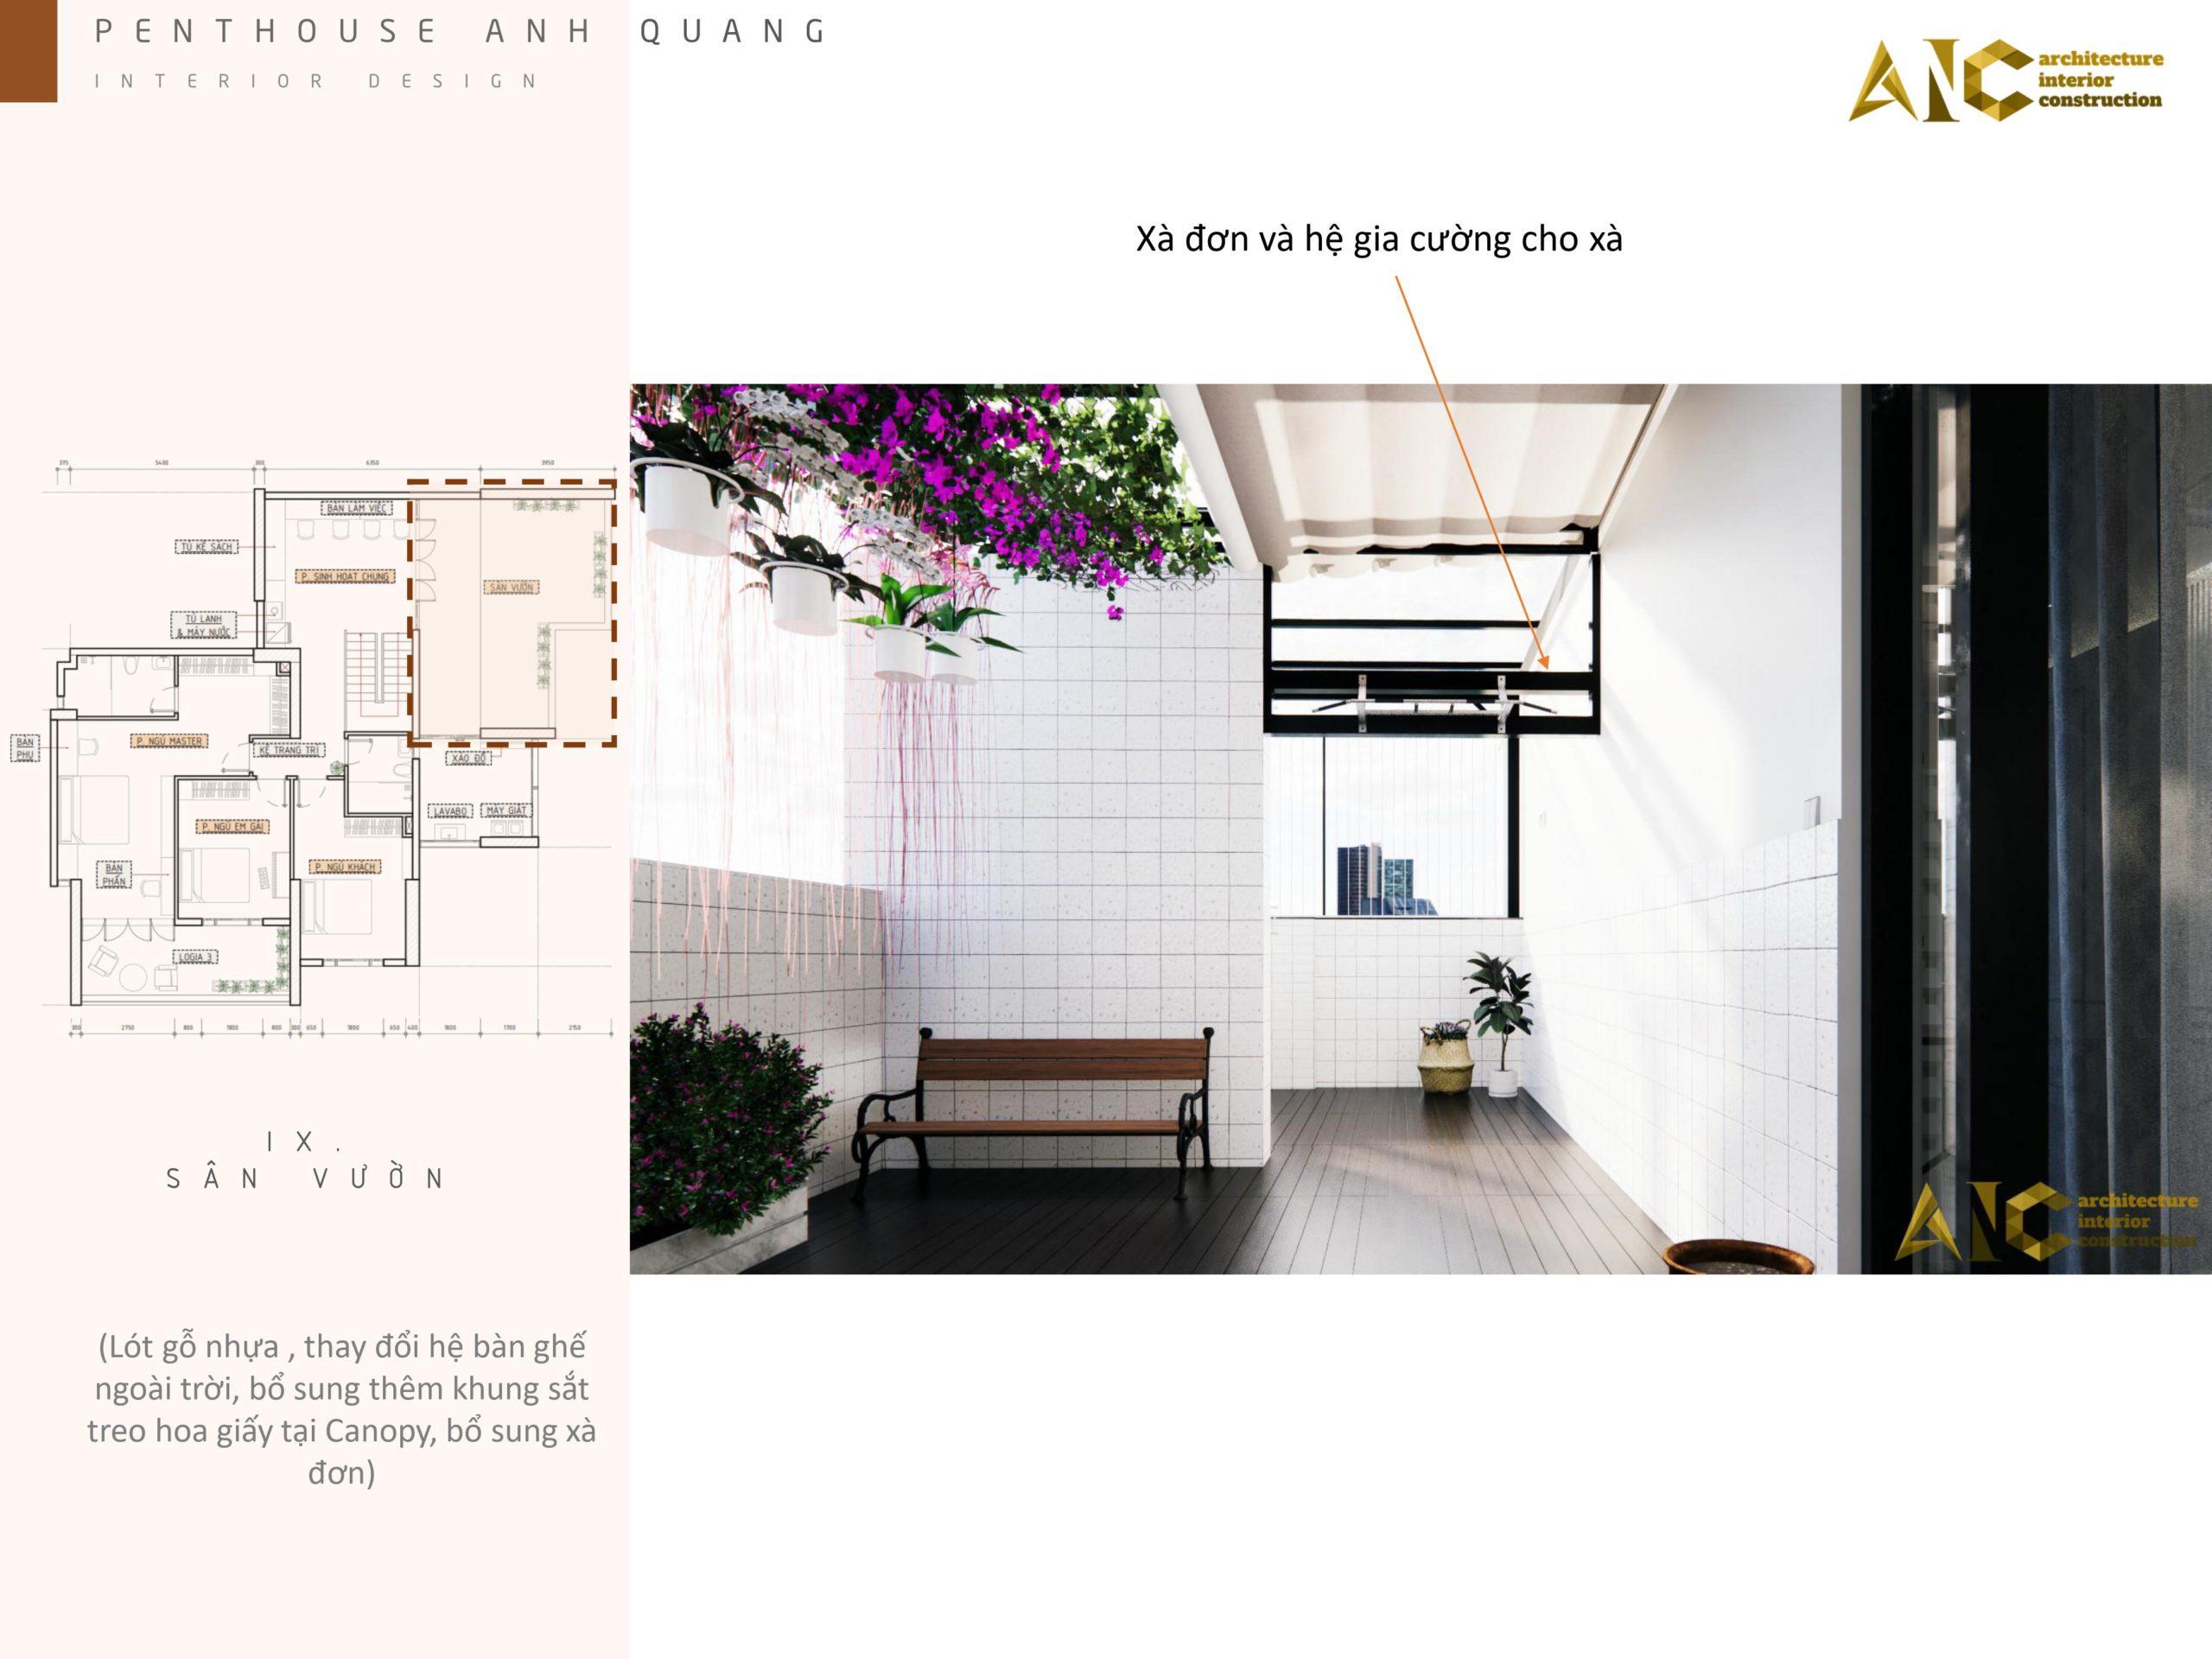 Penthouse-Anh-Quang-AIC-JSC-0034